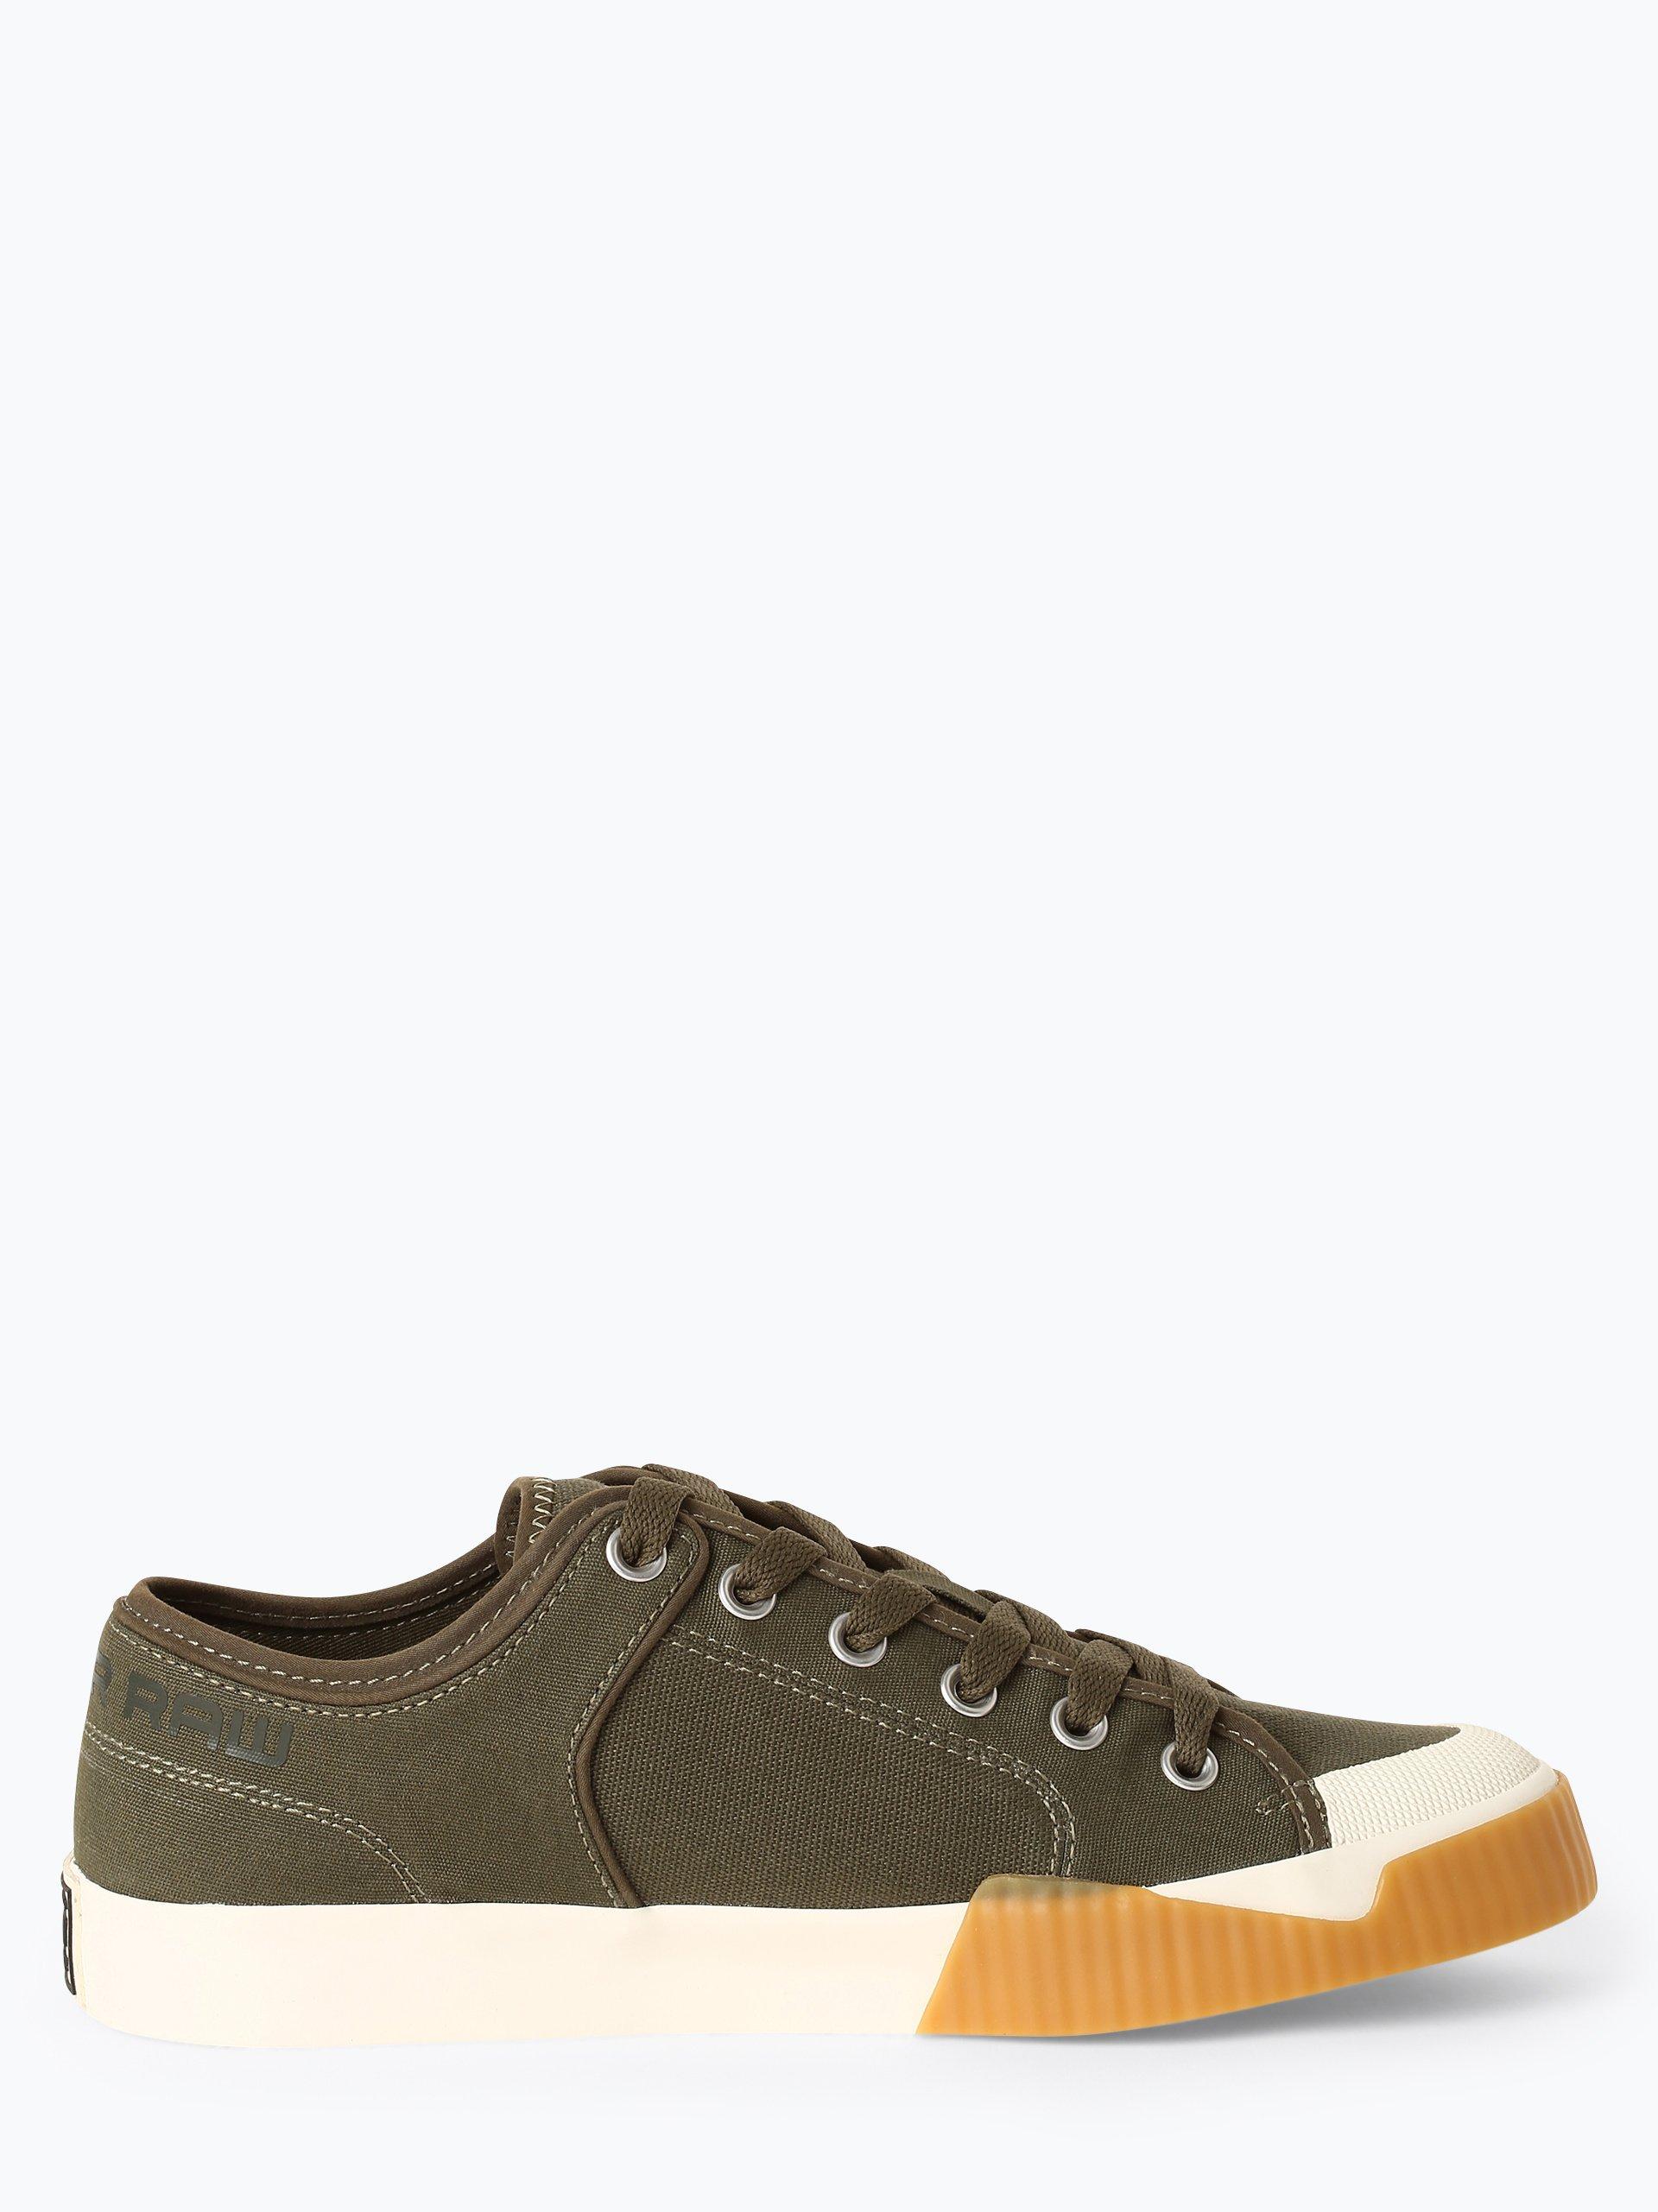 G-Star RAW Herren Sneaker